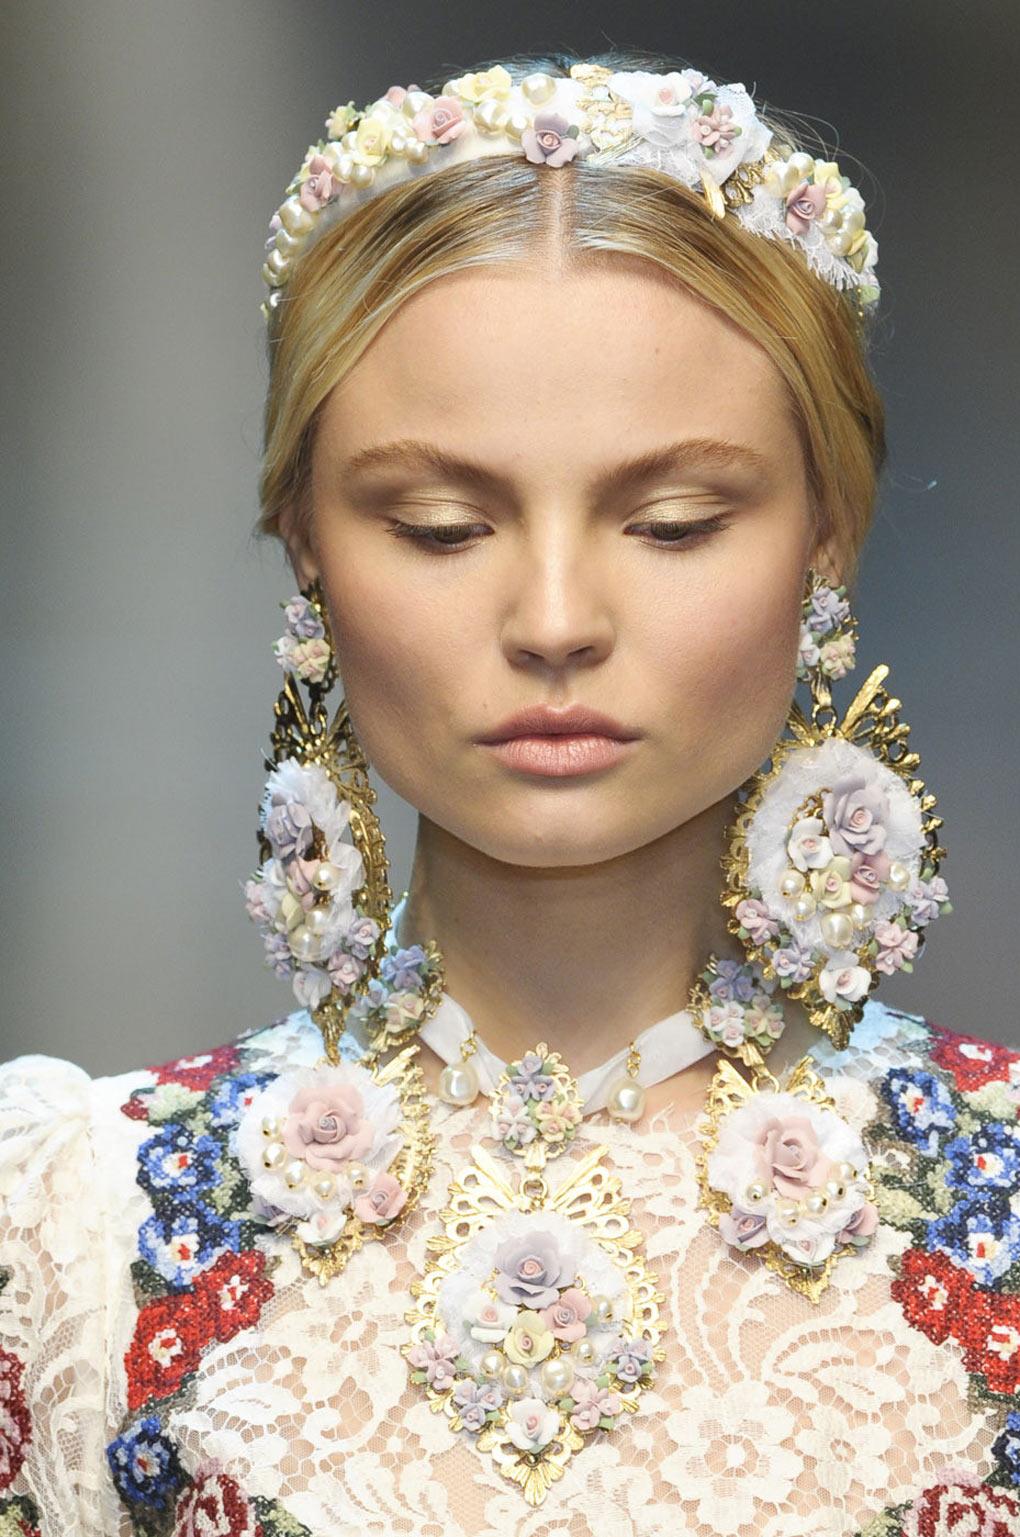 Dolce+Gabbana+Fall+2012+Details+WM0YvaQ54V7x